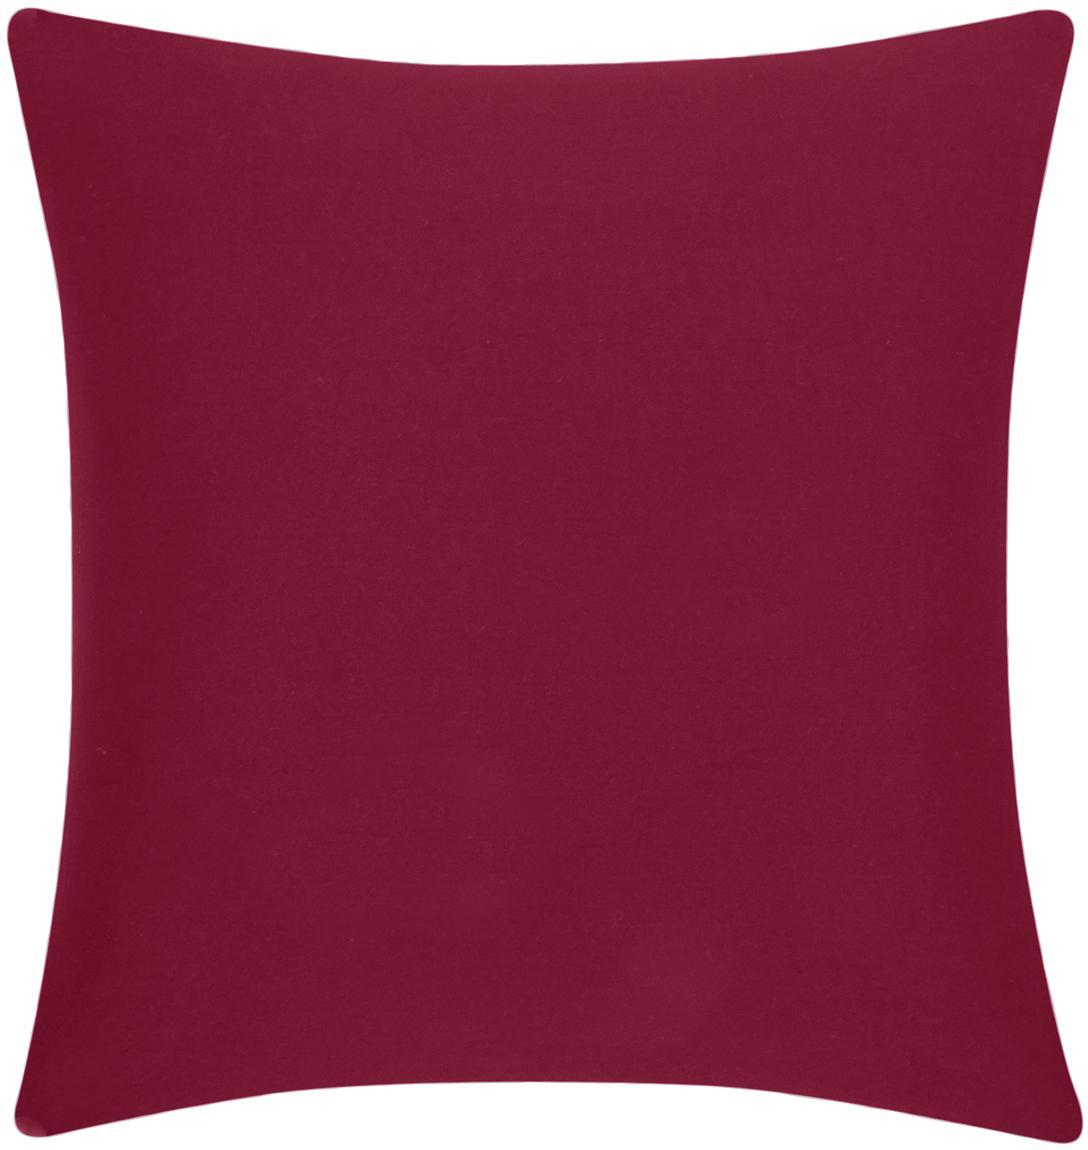 Federa arredo in rosso rosso Mads, 100% cotone, Rosso, Larg. 50 x Lung. 50 cm